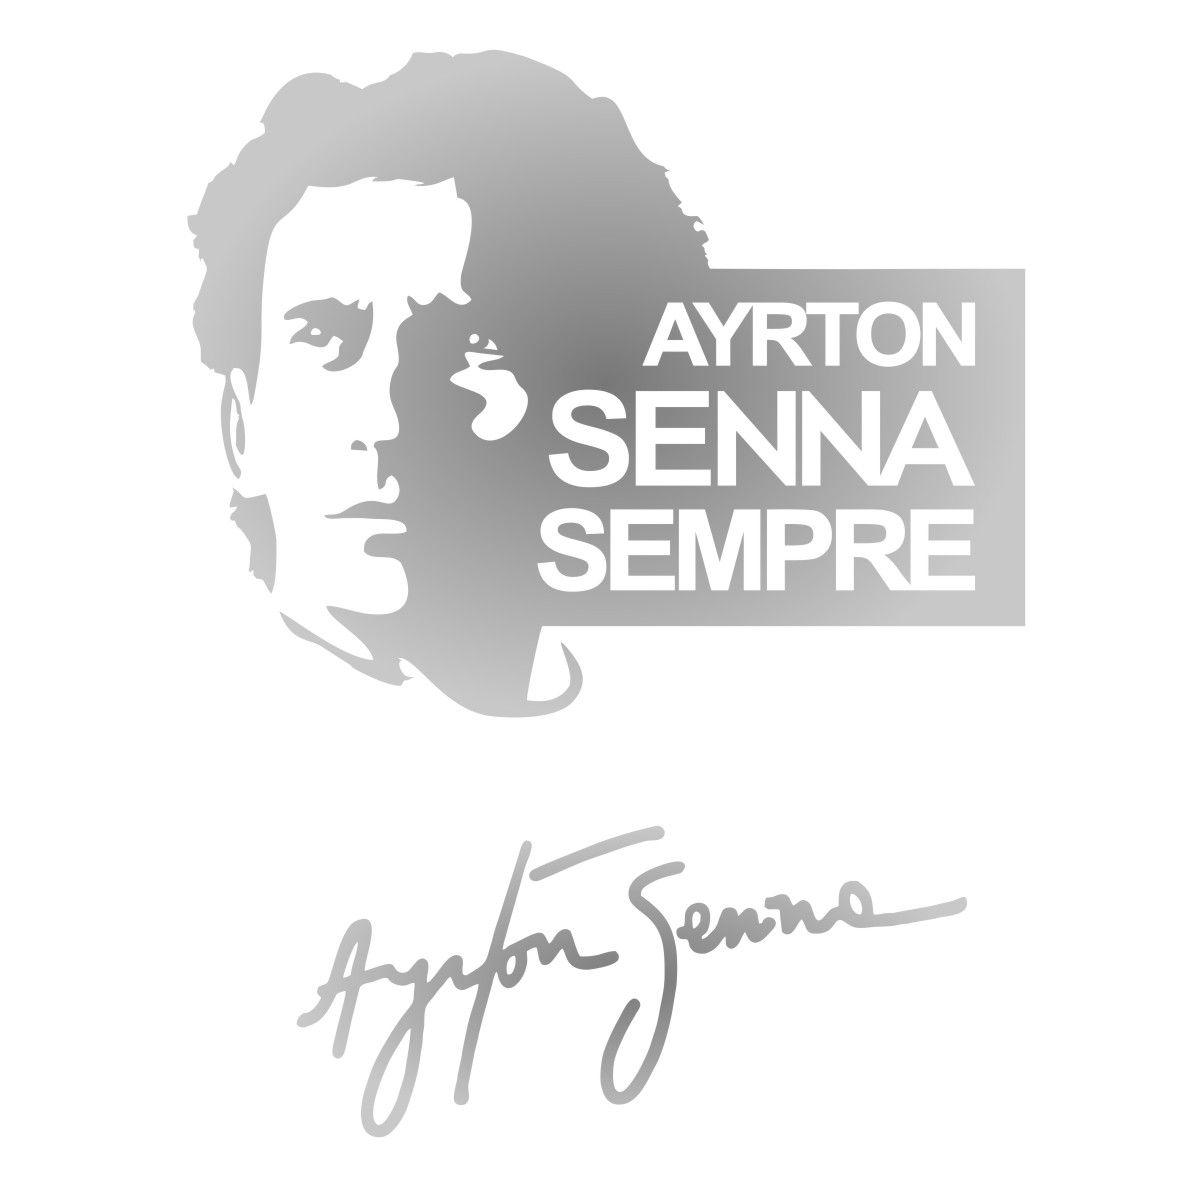 Adesivo Kit Ayrton Senna Sempre + Assinatura